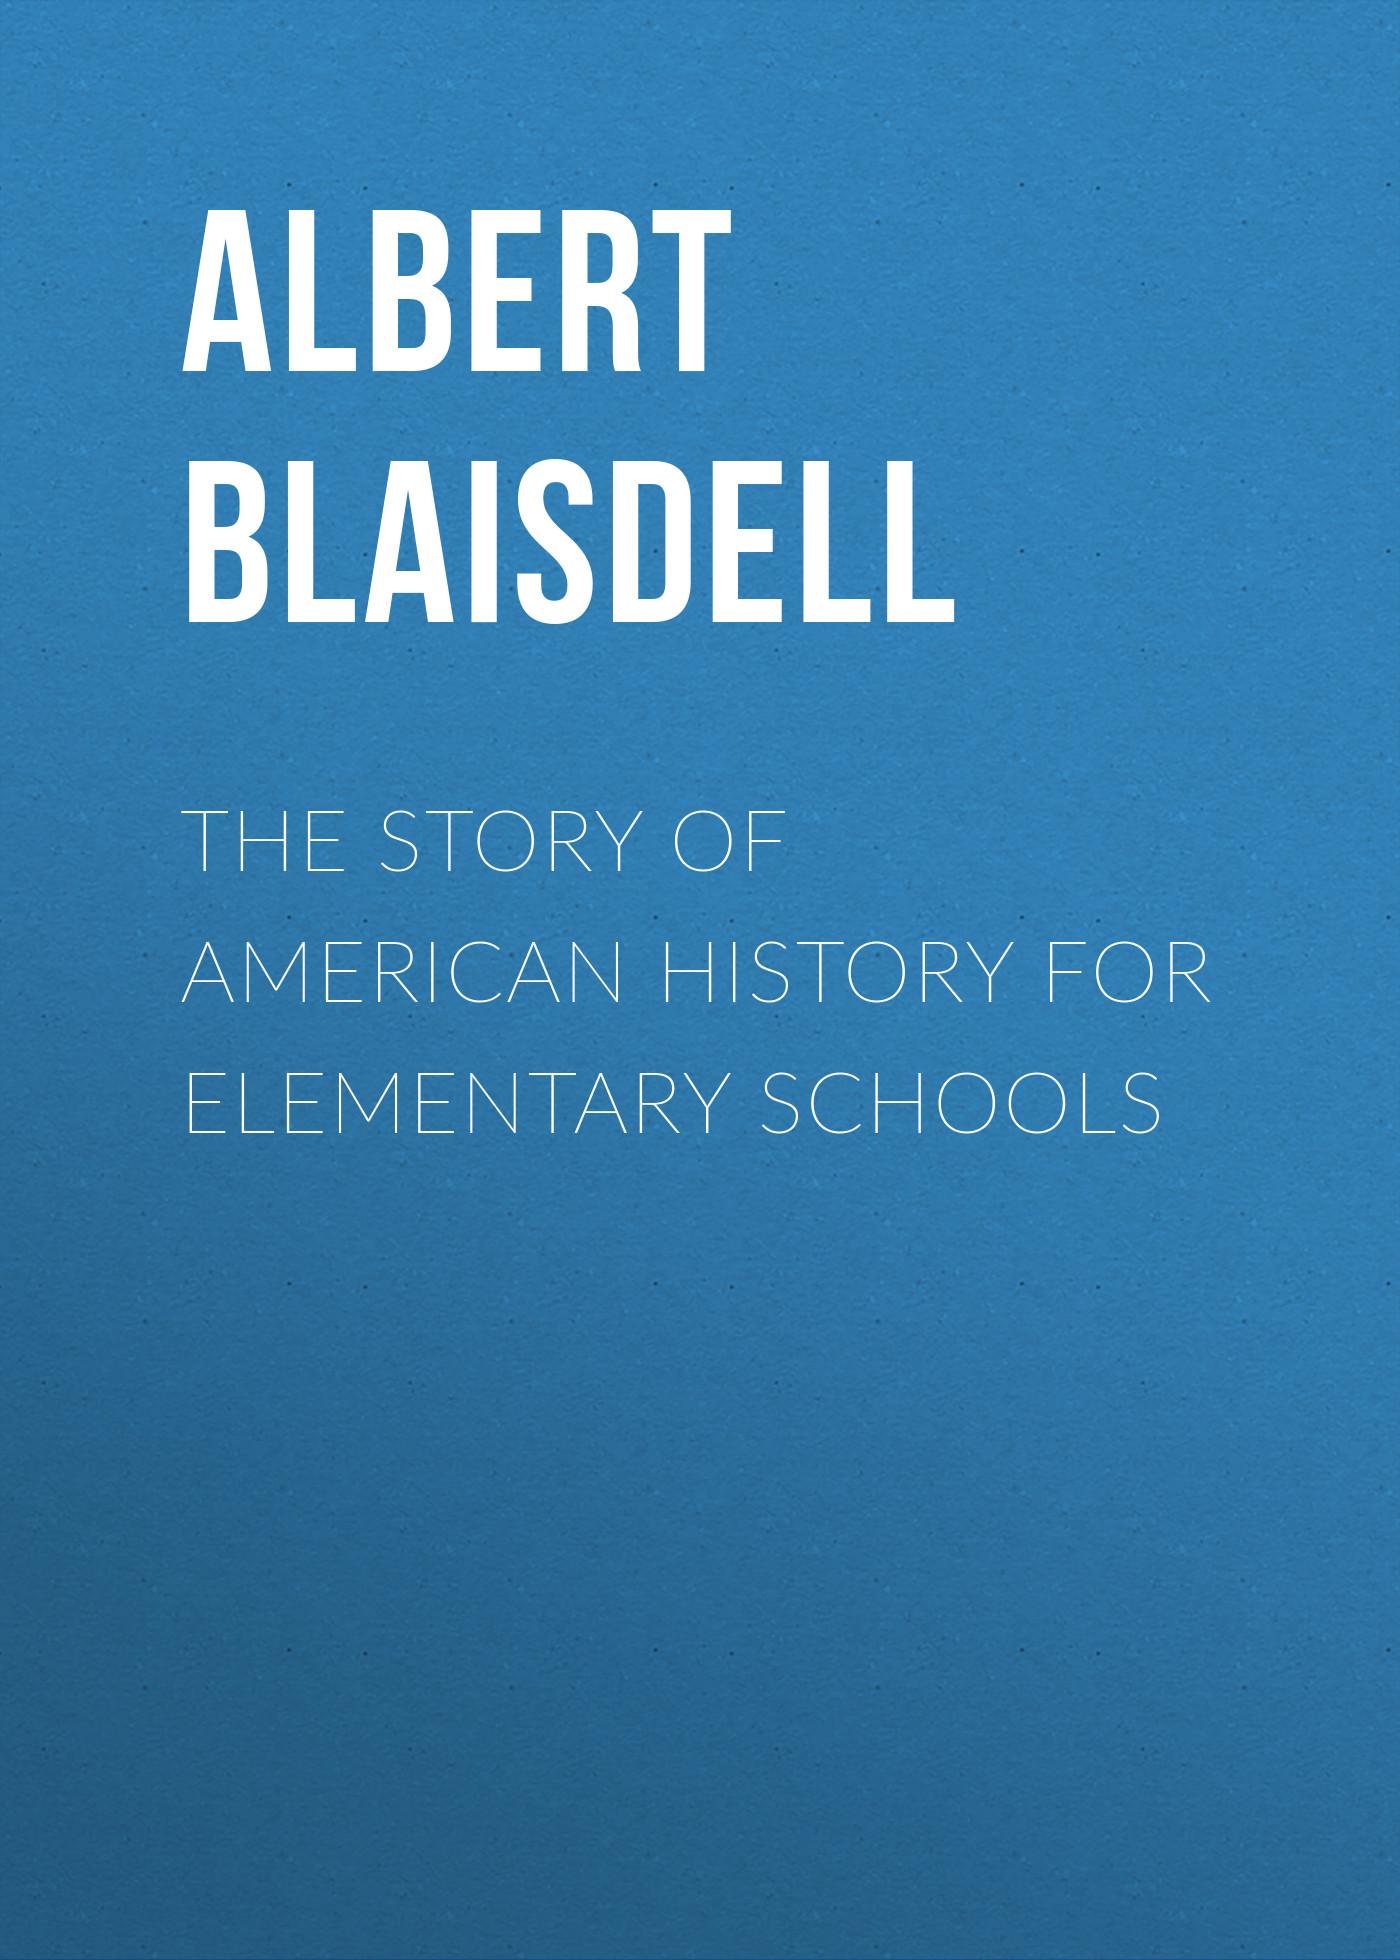 Blaisdell Albert Franklin The Story of American History for Elementary Schools shambaugh benjamin franklin history of the constitutions of iowa